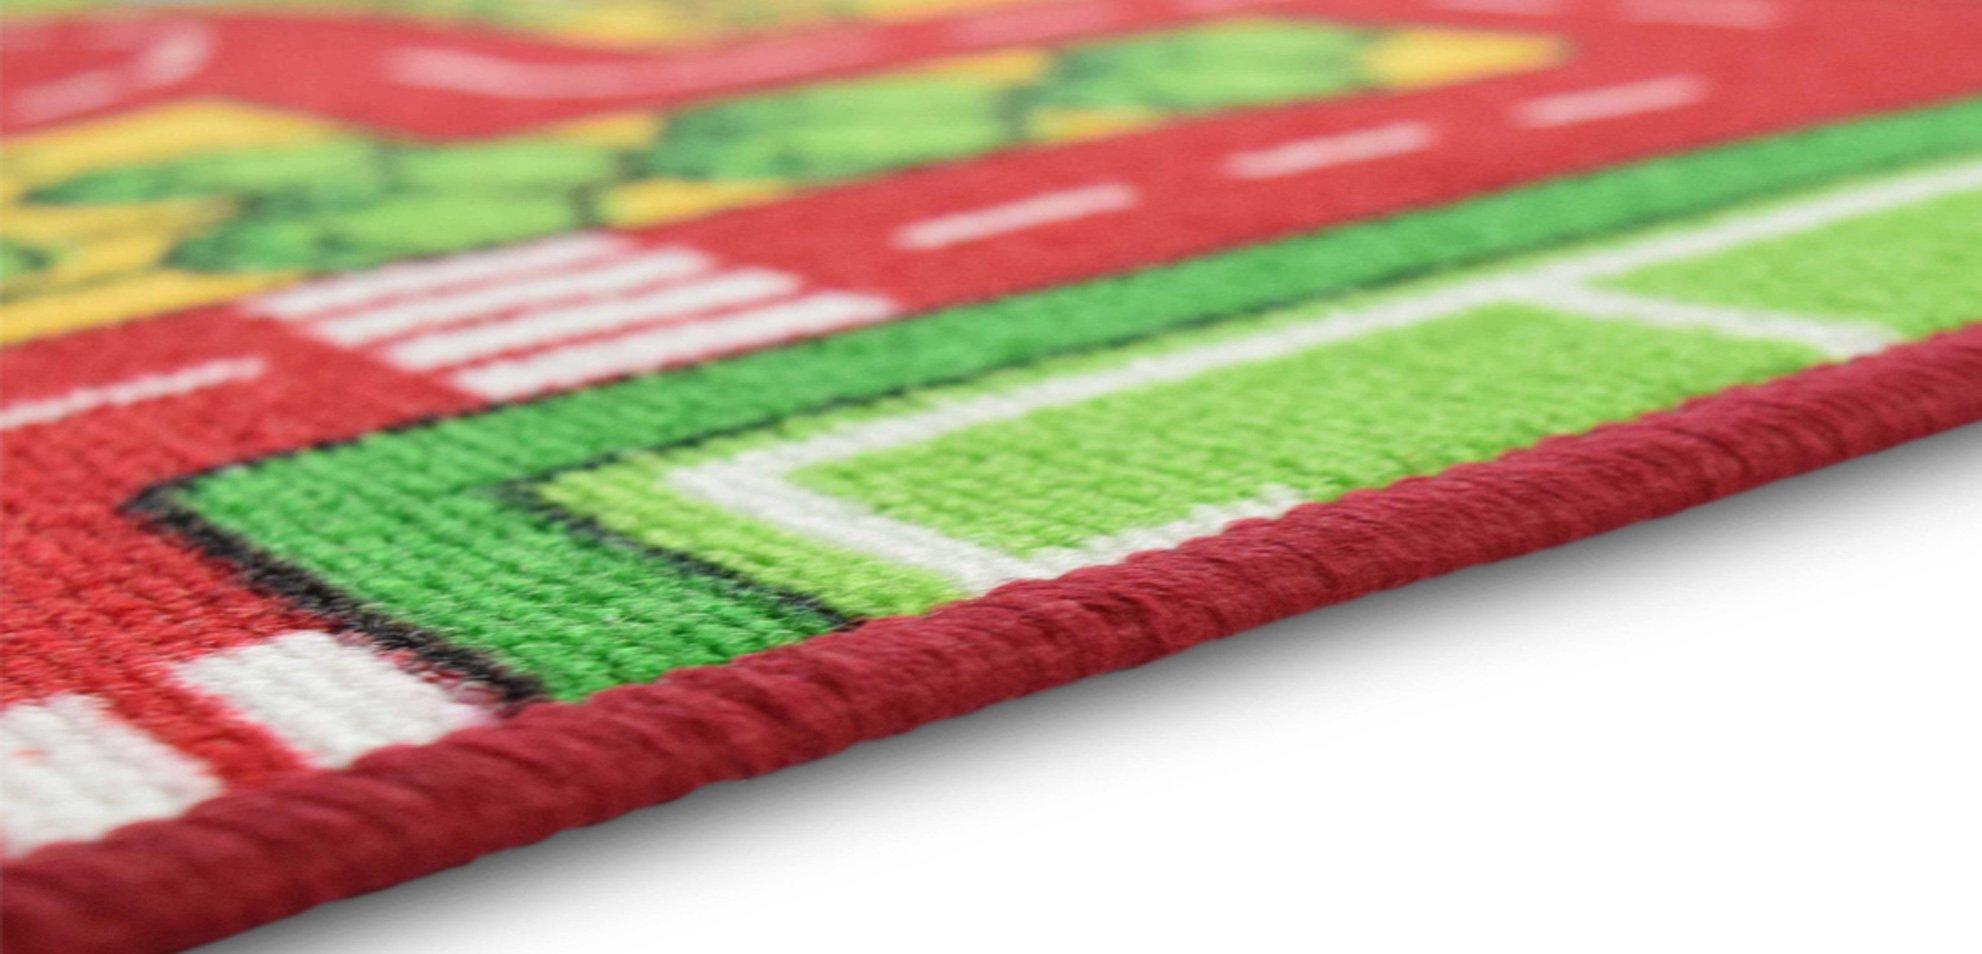 3m Carpet Mats Suppliers In Dubai Uae Electrical Rubber Floor